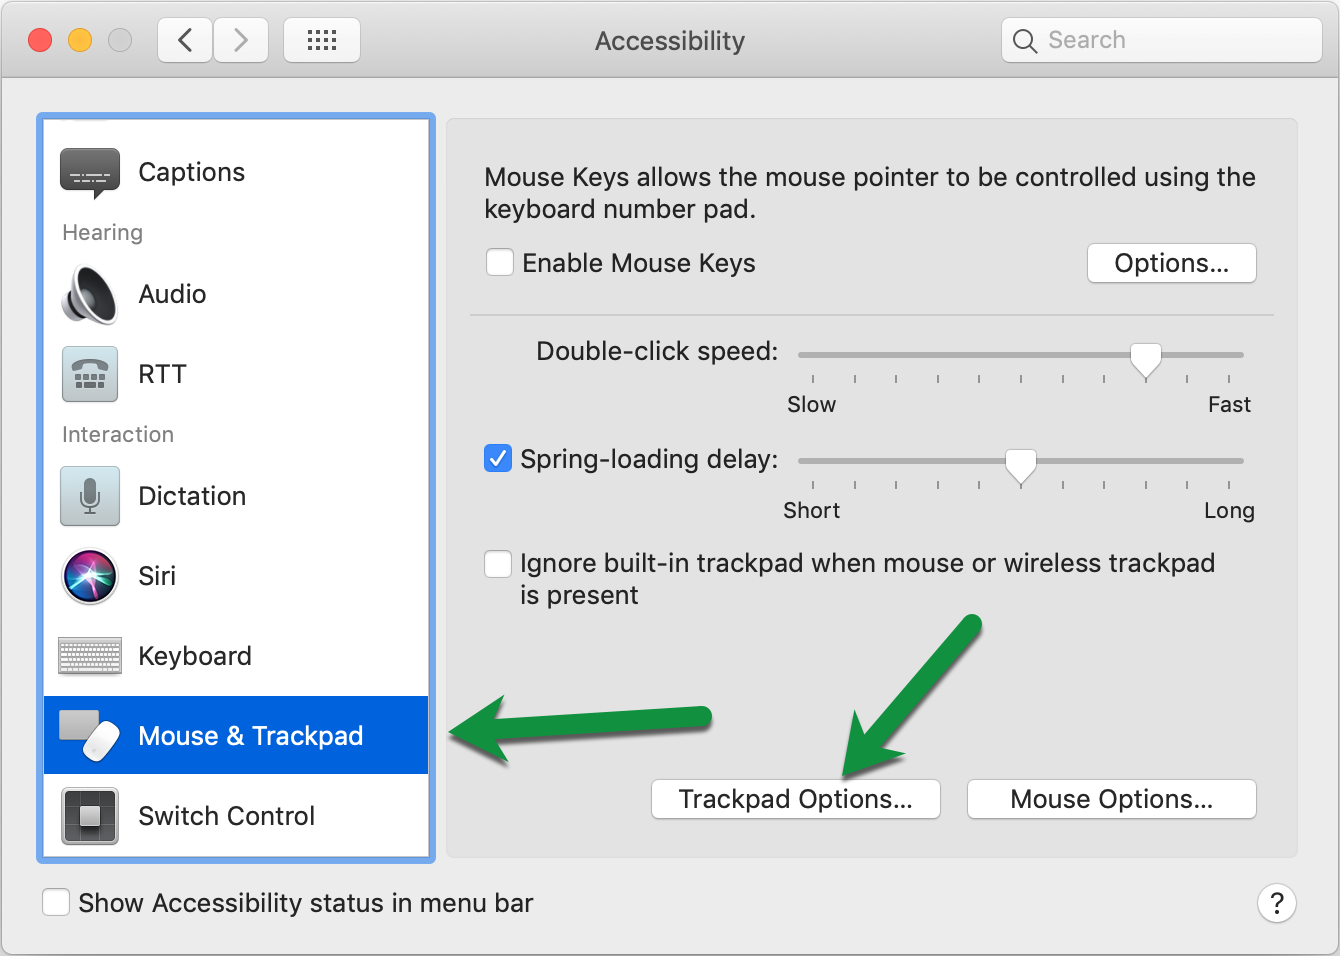 Mouse & Tackpad